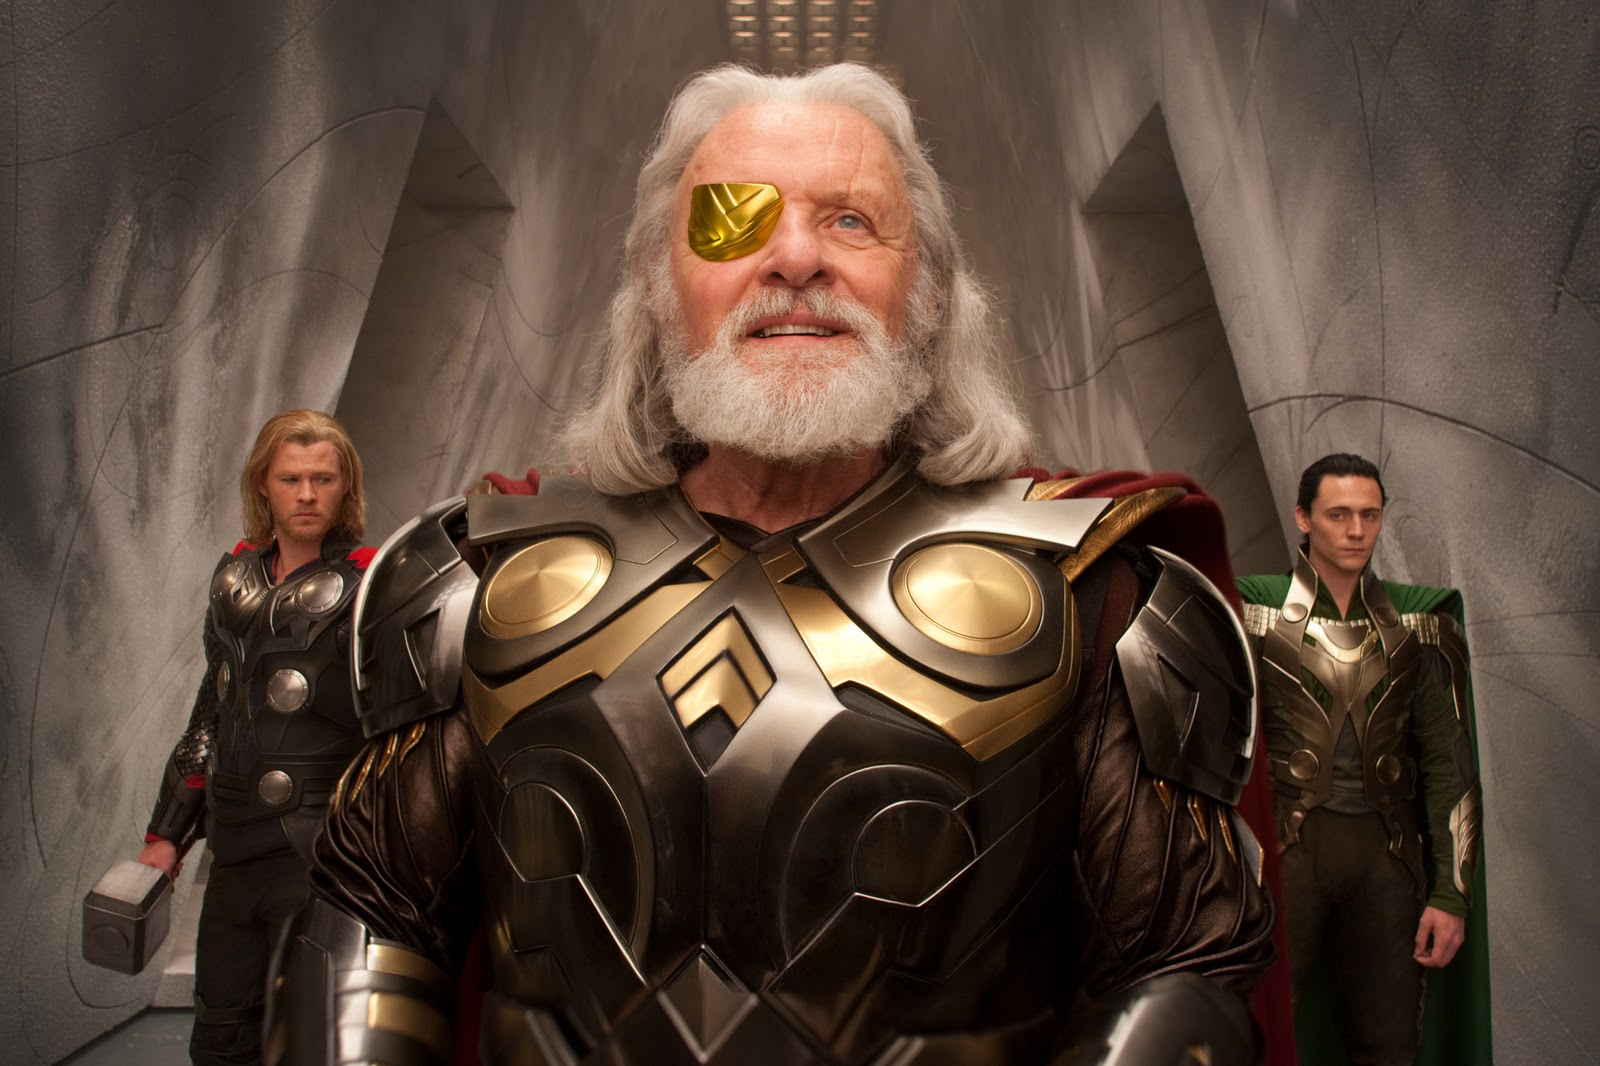 http://2.bp.blogspot.com/-yd8NRrVEbB0/TbXKfP_gtsI/AAAAAAAABP0/-JTqjV2nUhg/s1600/Thor_Movie_Image_Thor_Odin_Loki.jpg